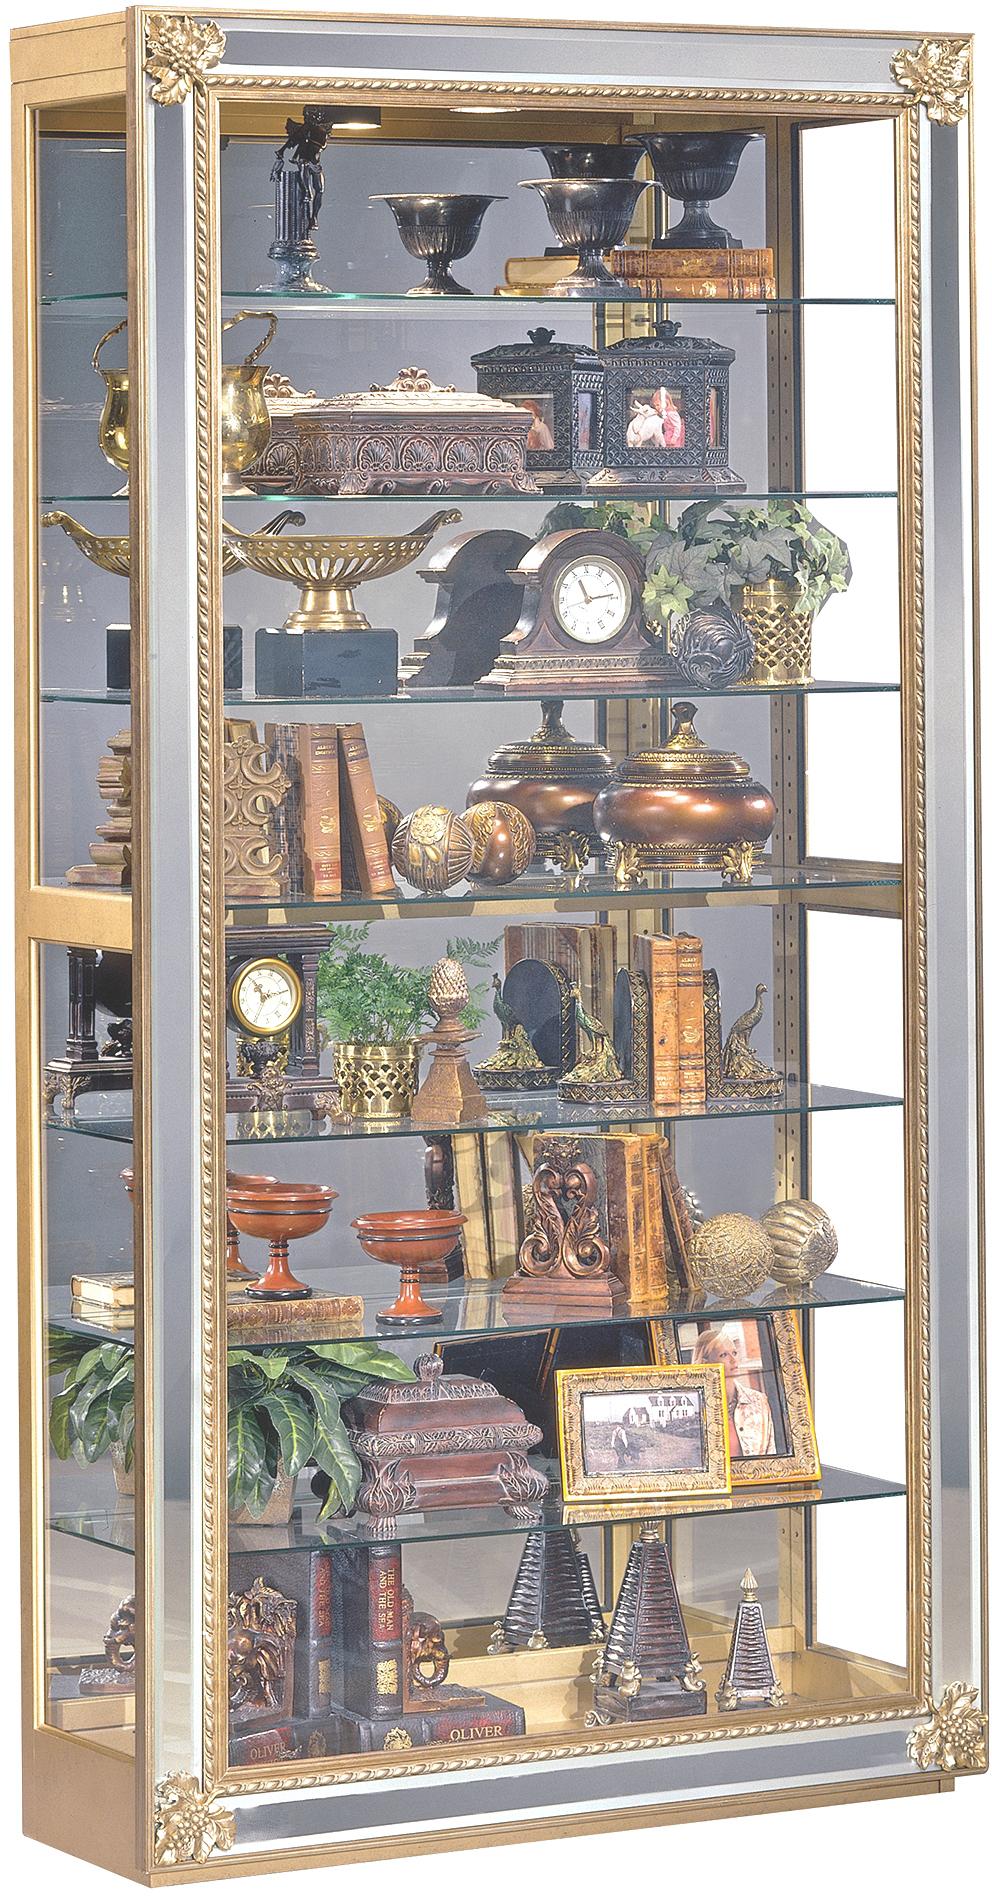 Philip Reinisch Museum Reflection Sliding Door Fine Art Picture Frame Curio Cabinet Rune S Furniture Curio Cabinet